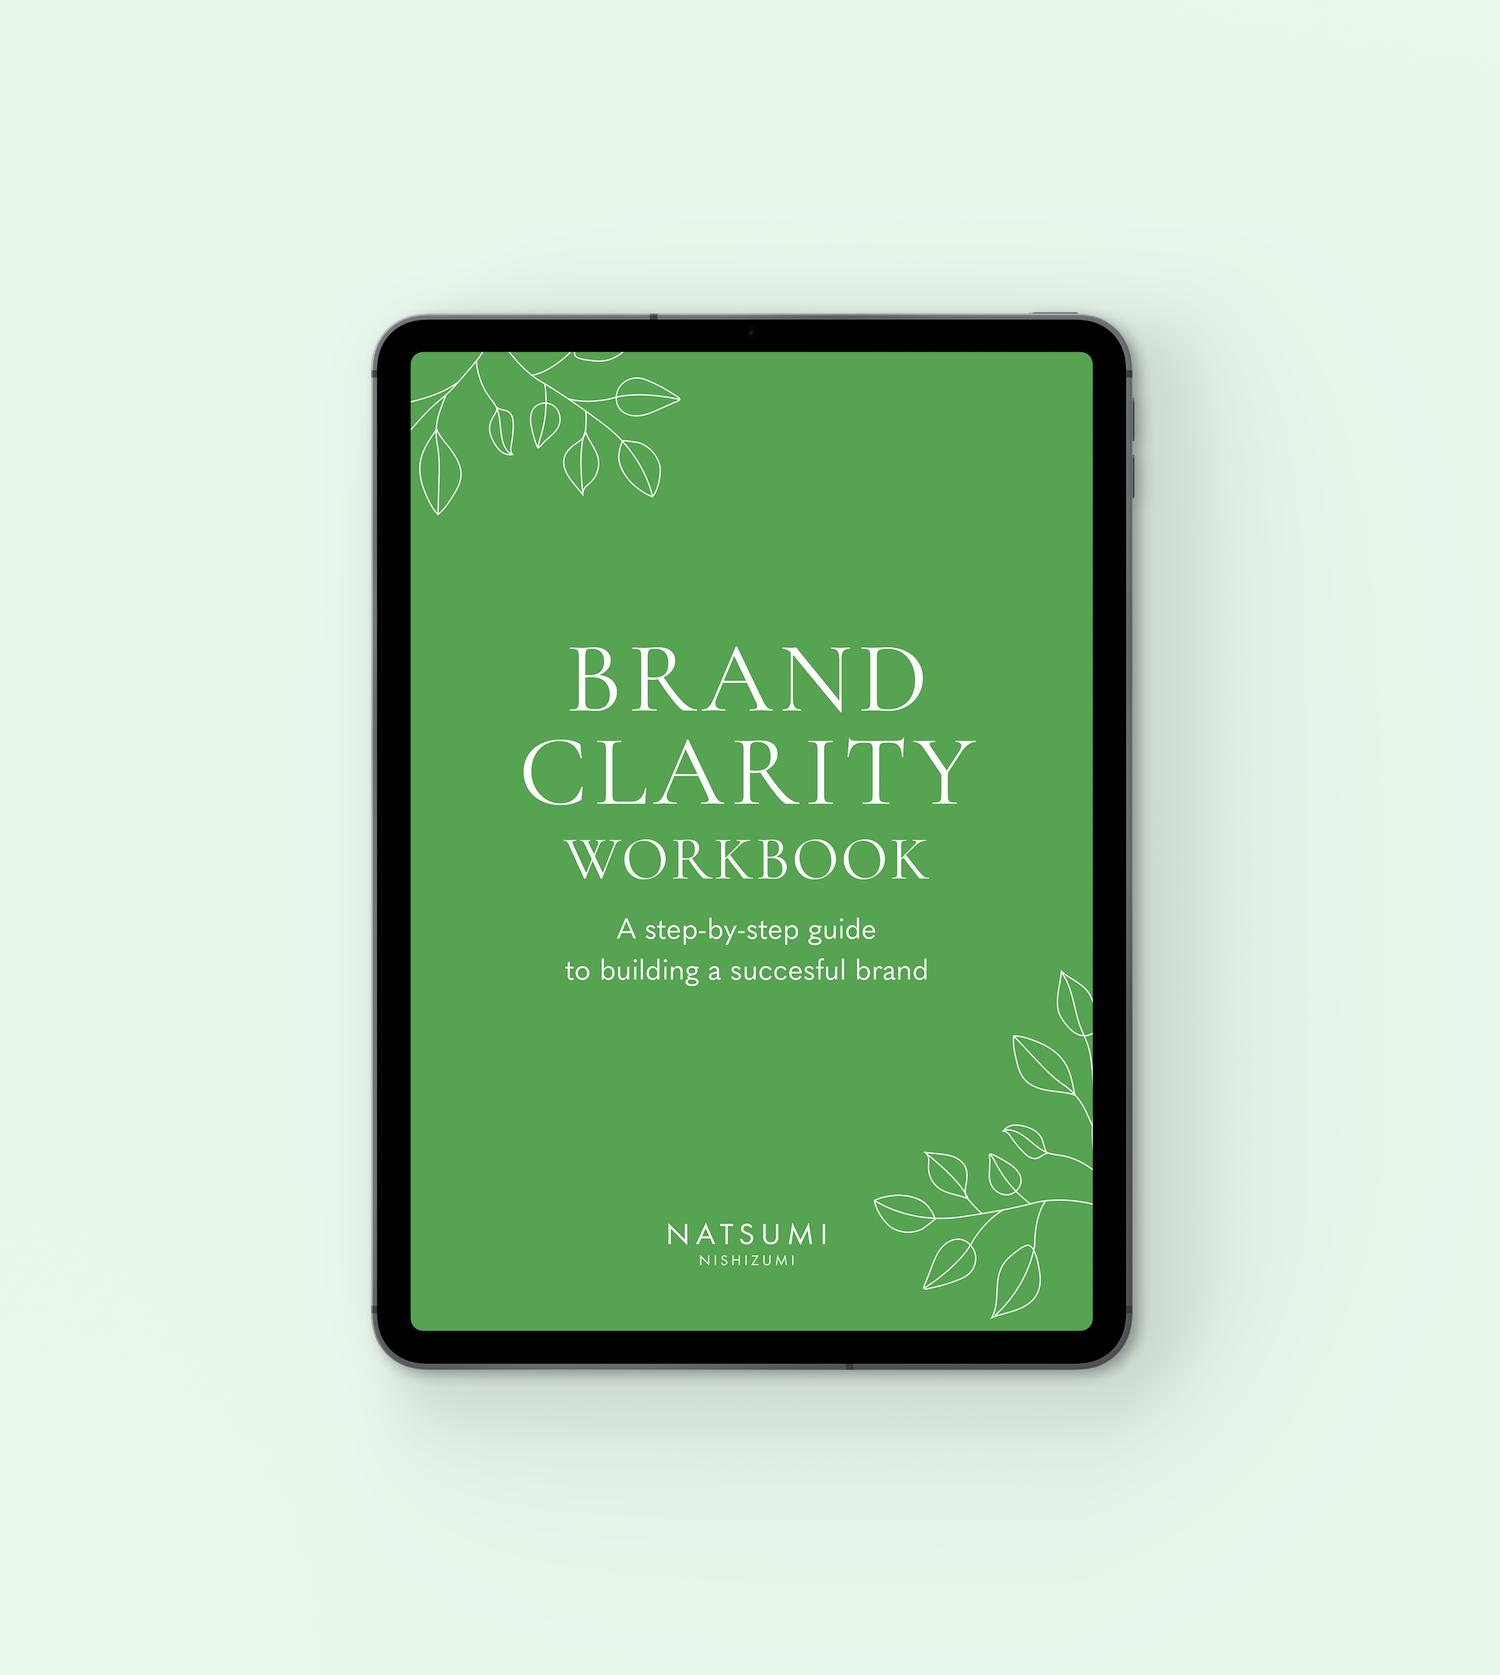 Brand Clarity Workbook by Natsumi Nishizumi